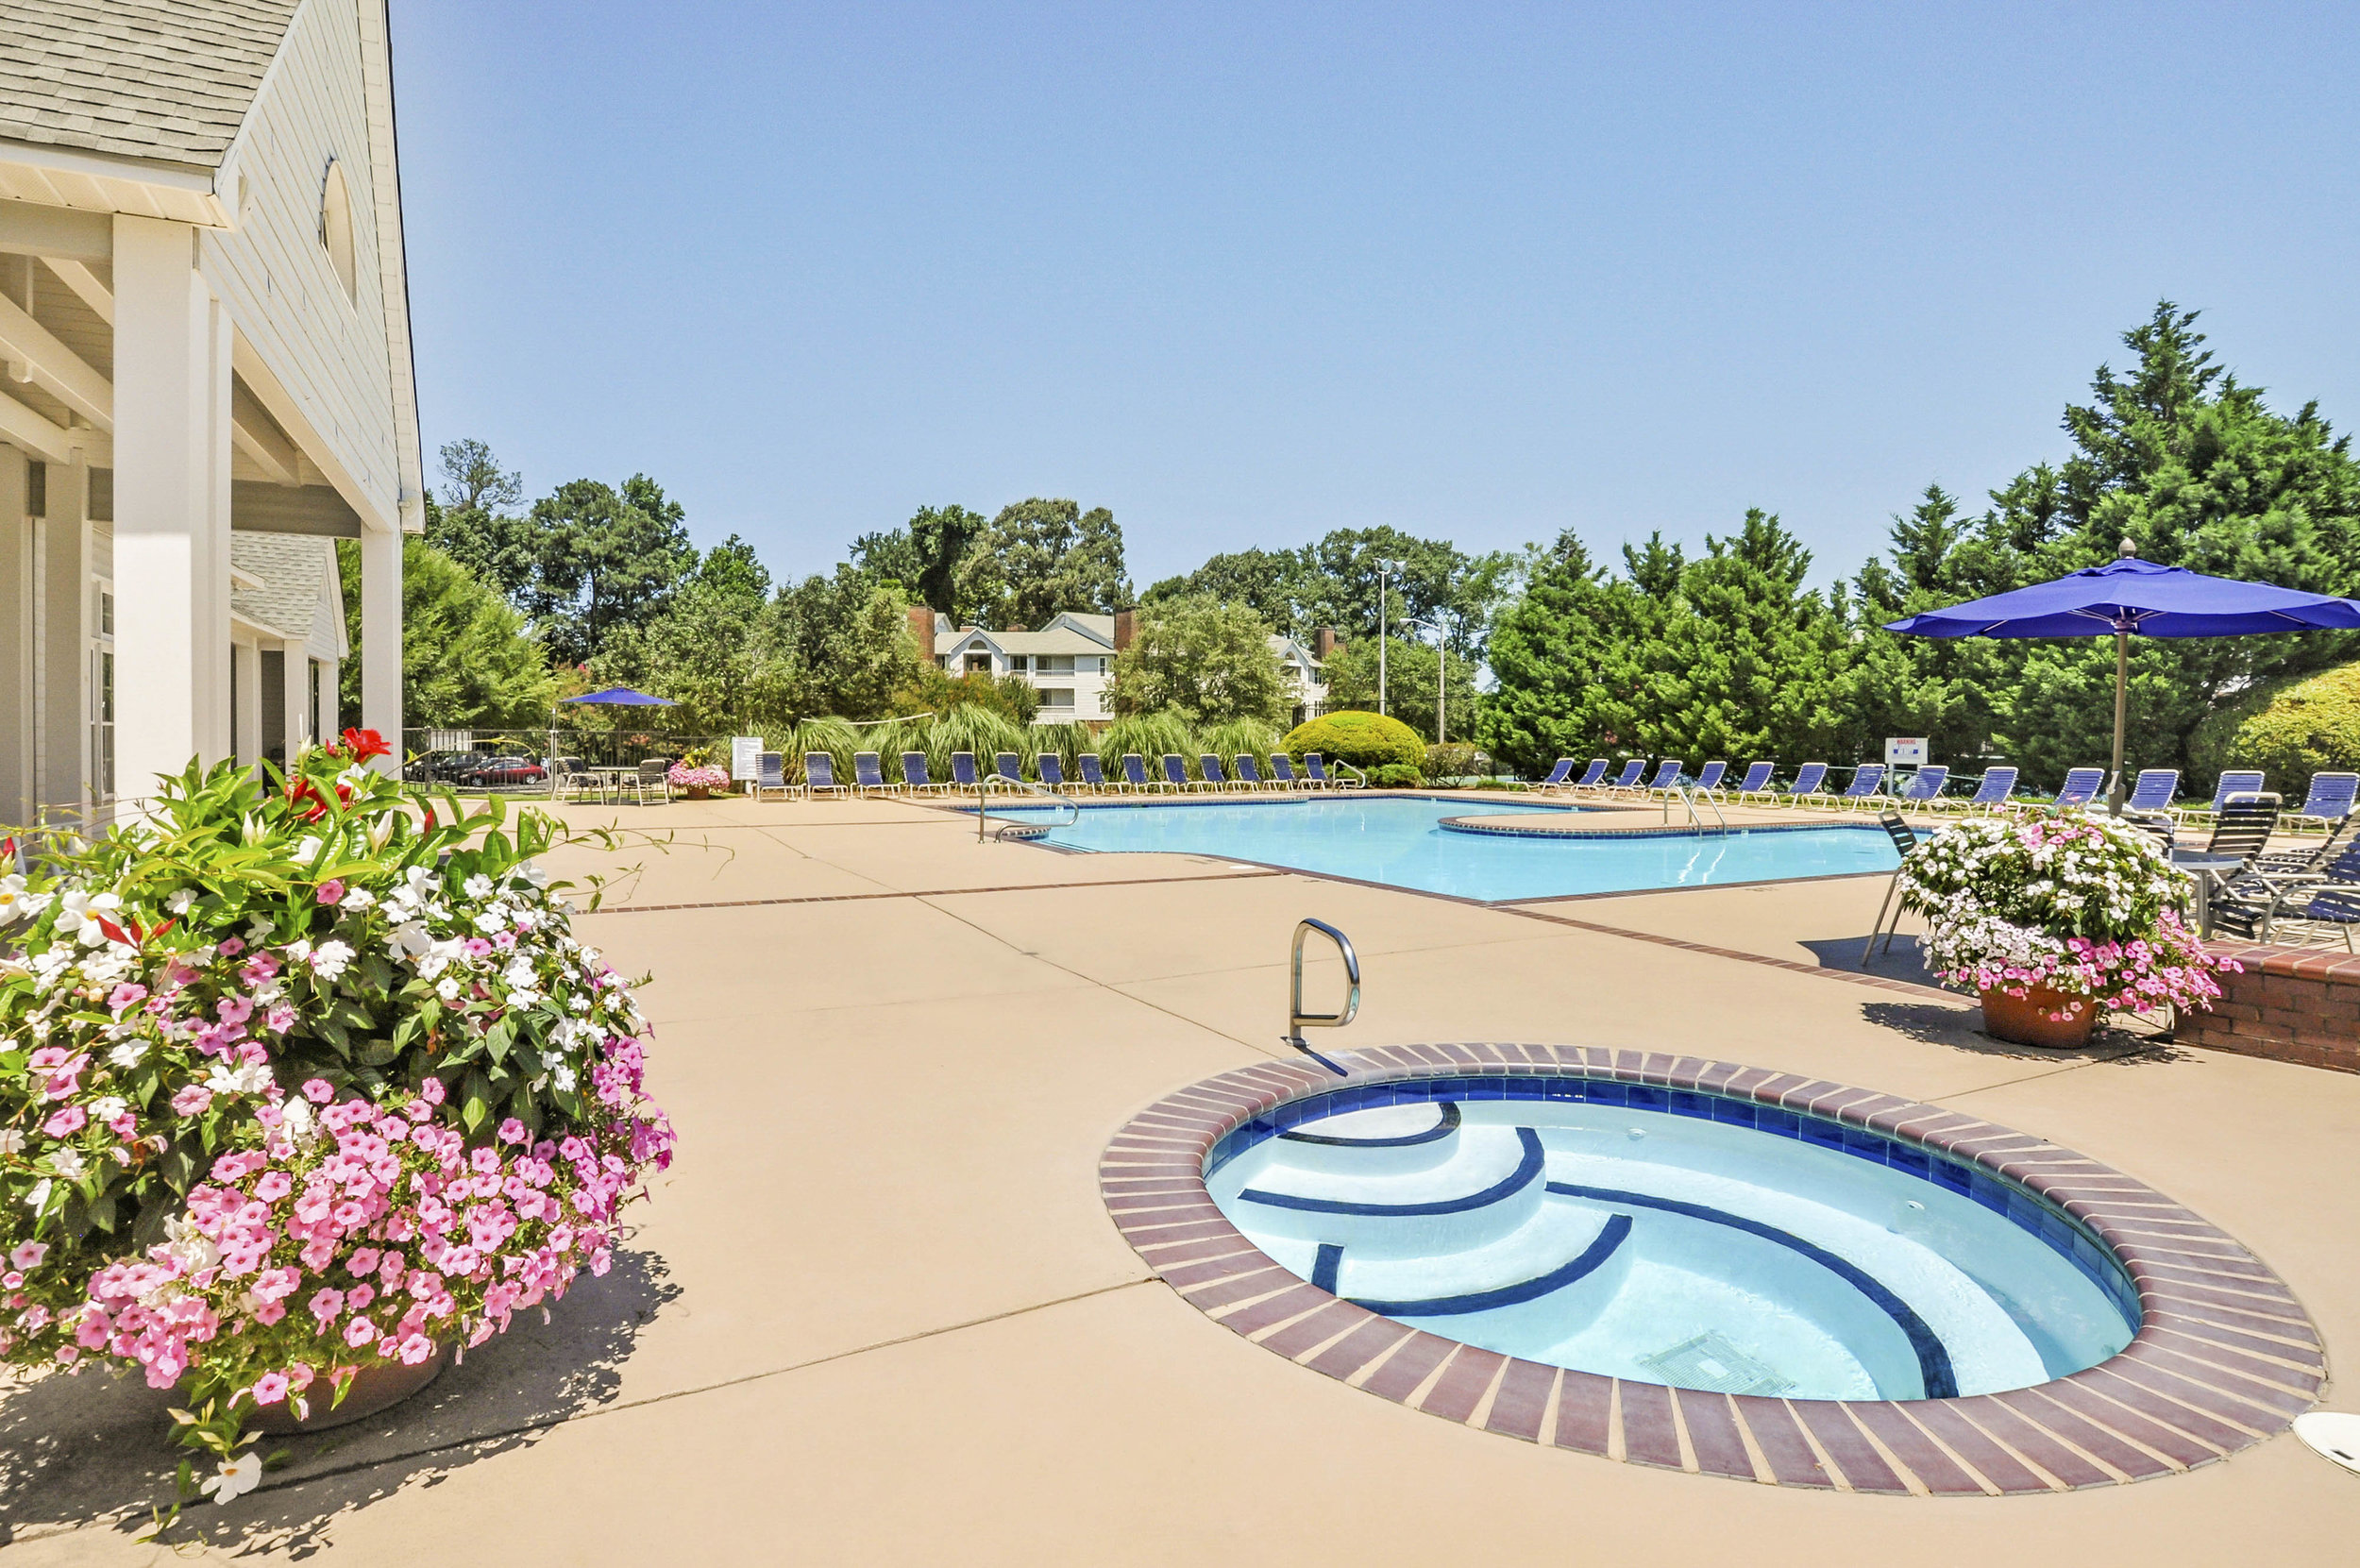 Pool Treybrooke Greenville NC-PH-9 2.JPG